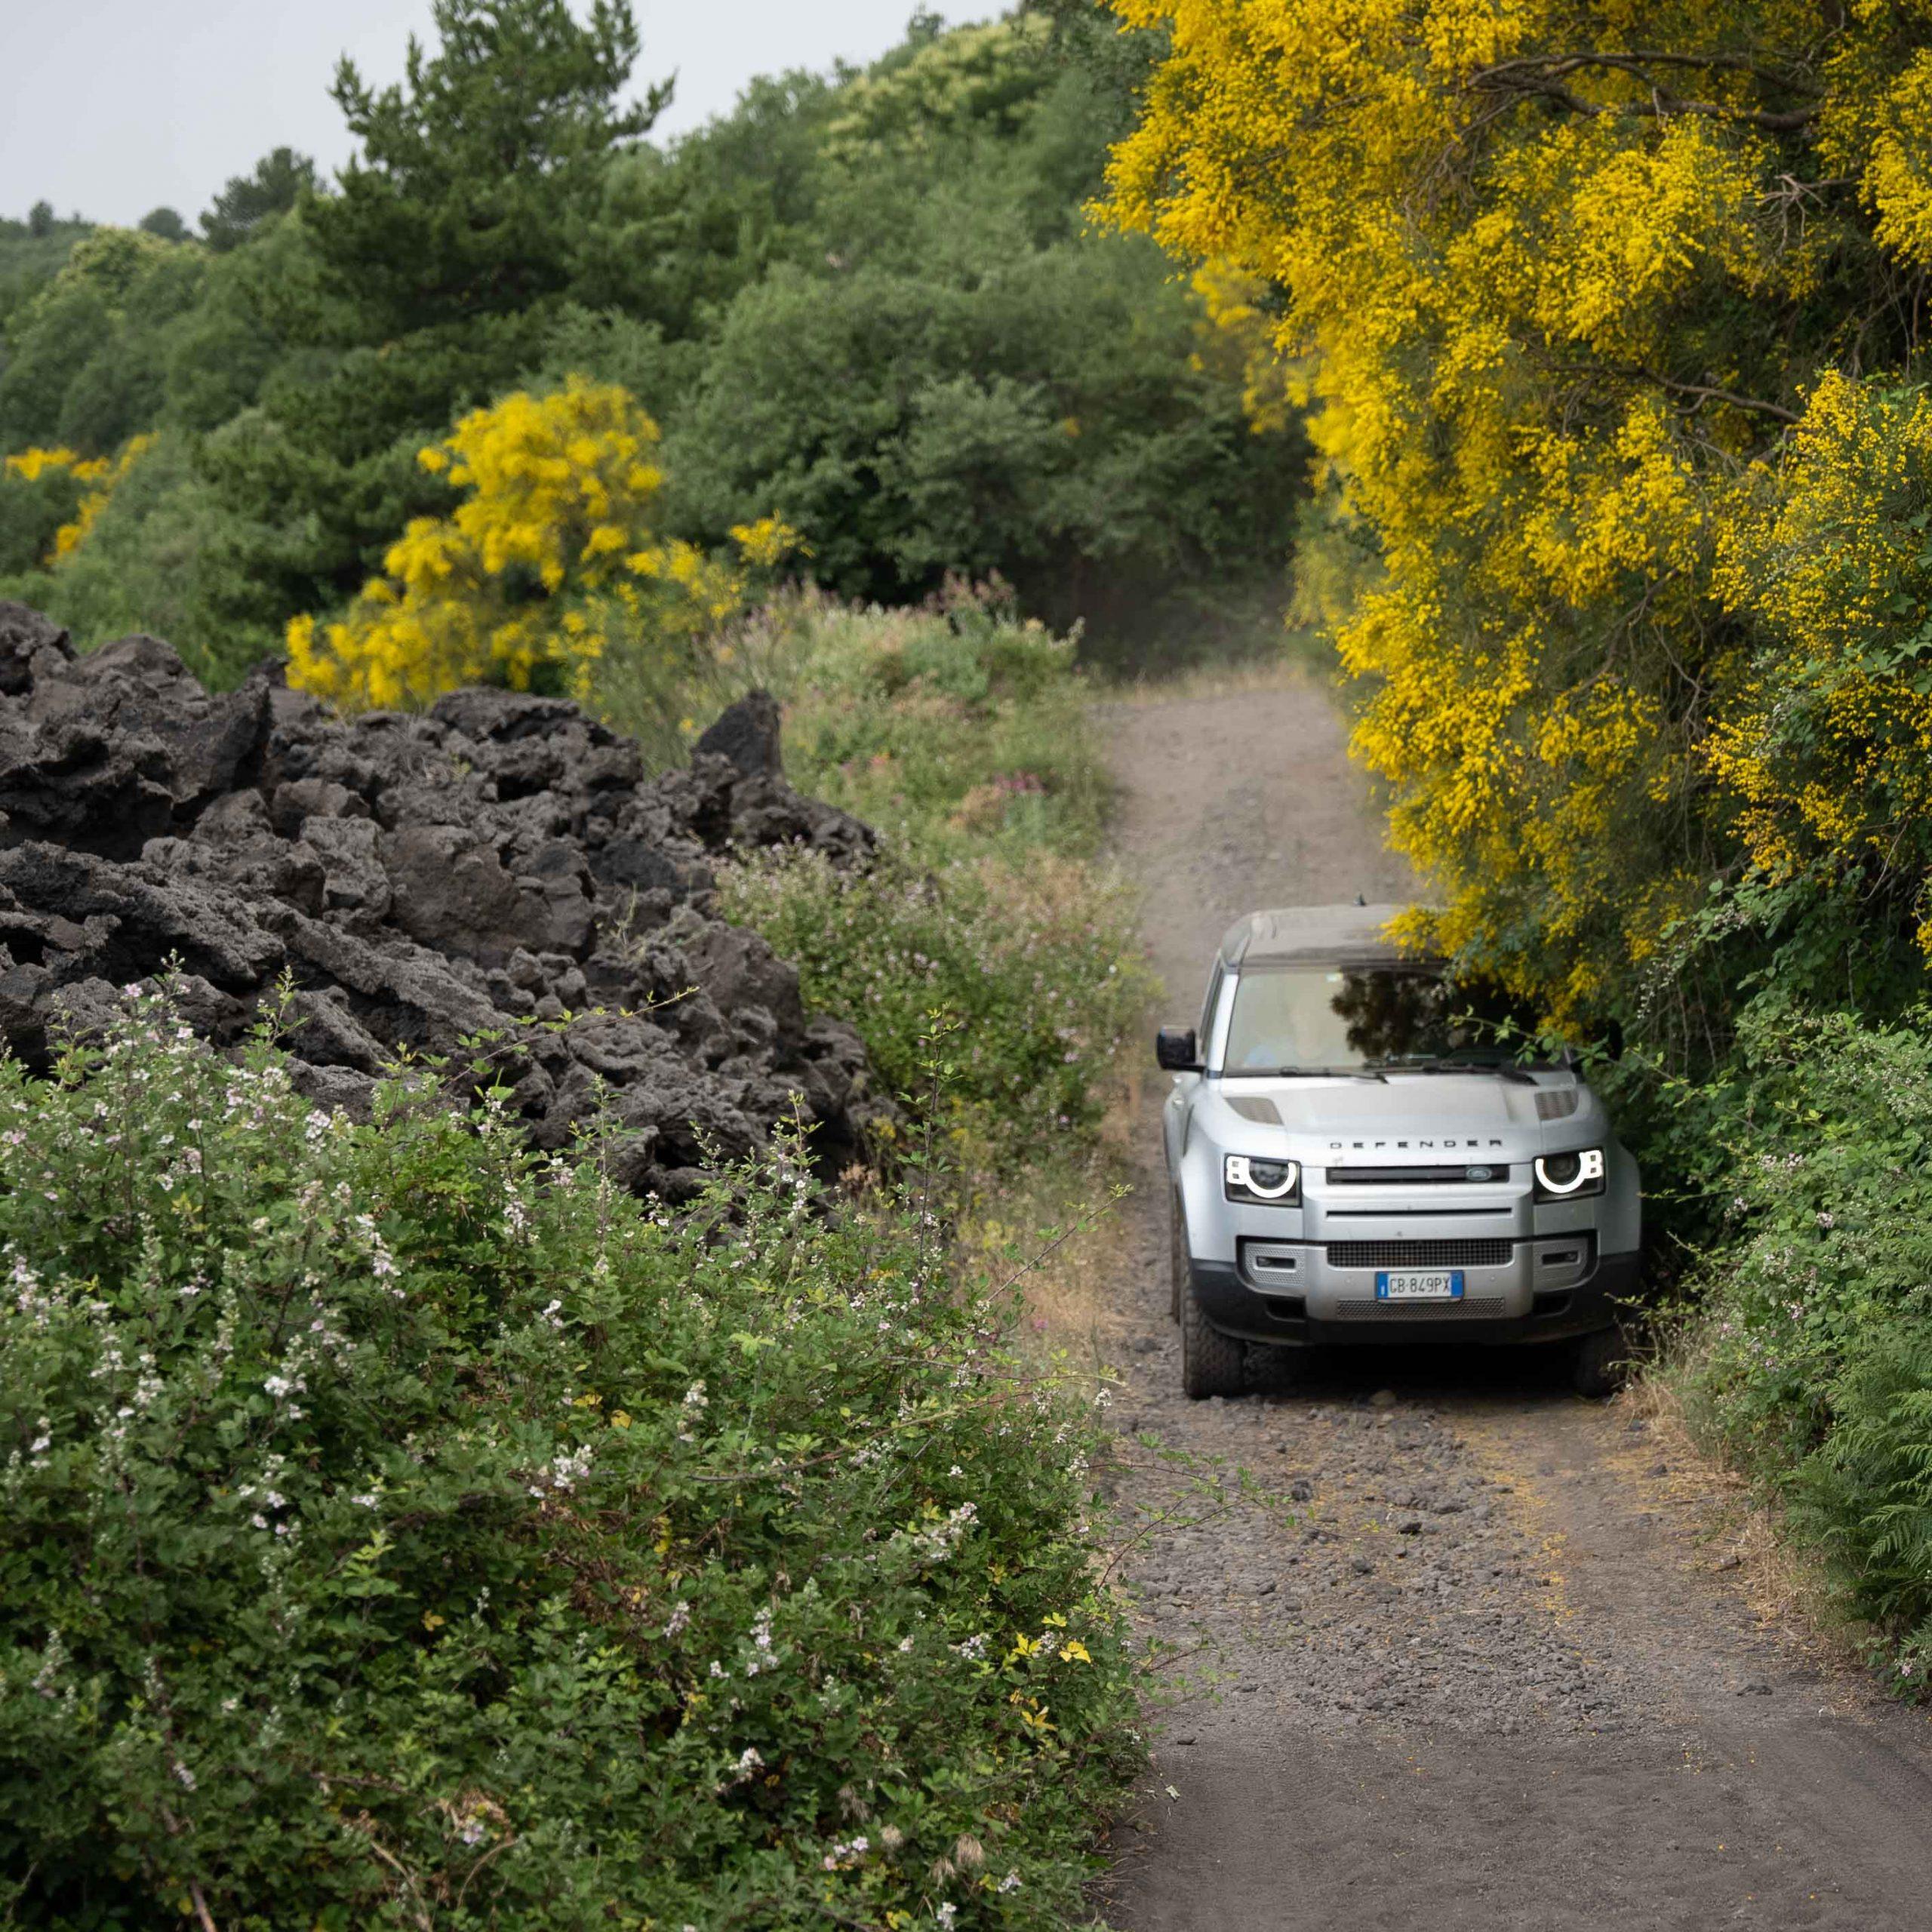 Land_Rover_Tour_Sicilia_2021_Land_Rover_Experience_Italia_-108